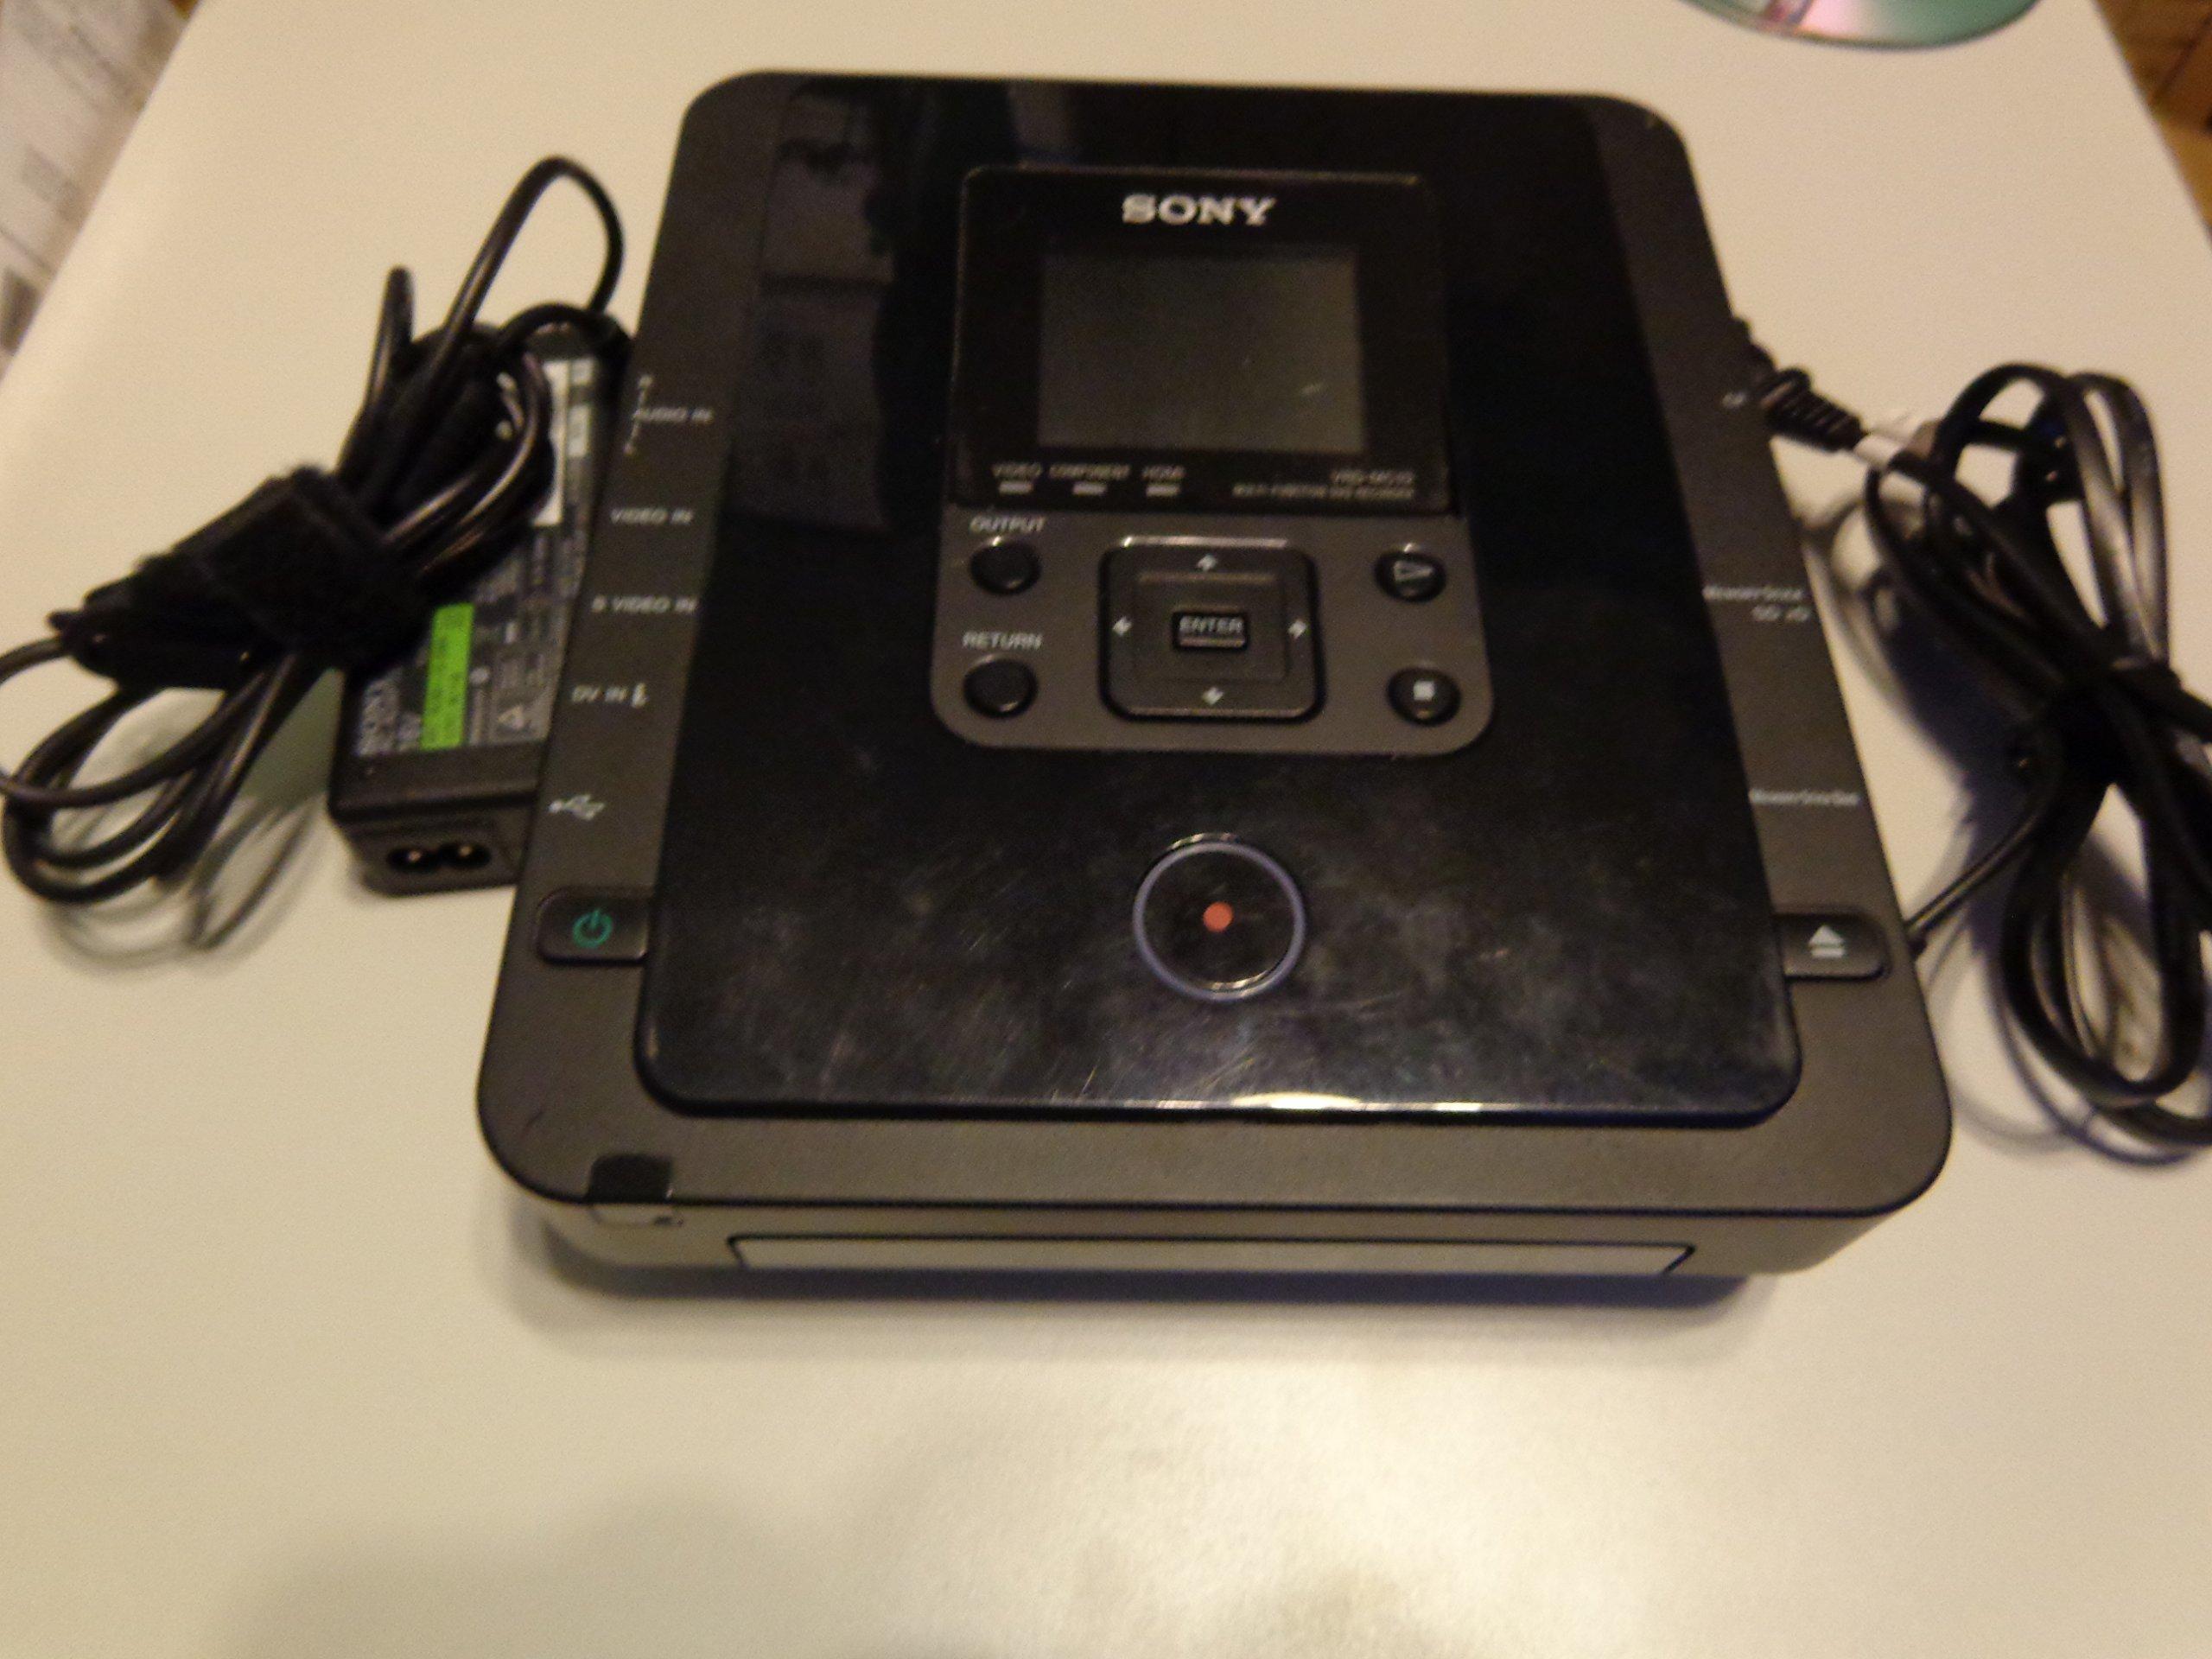 Sony DVDirect VRDMC10 Stand Alone DVD Recorder/Player (Black)